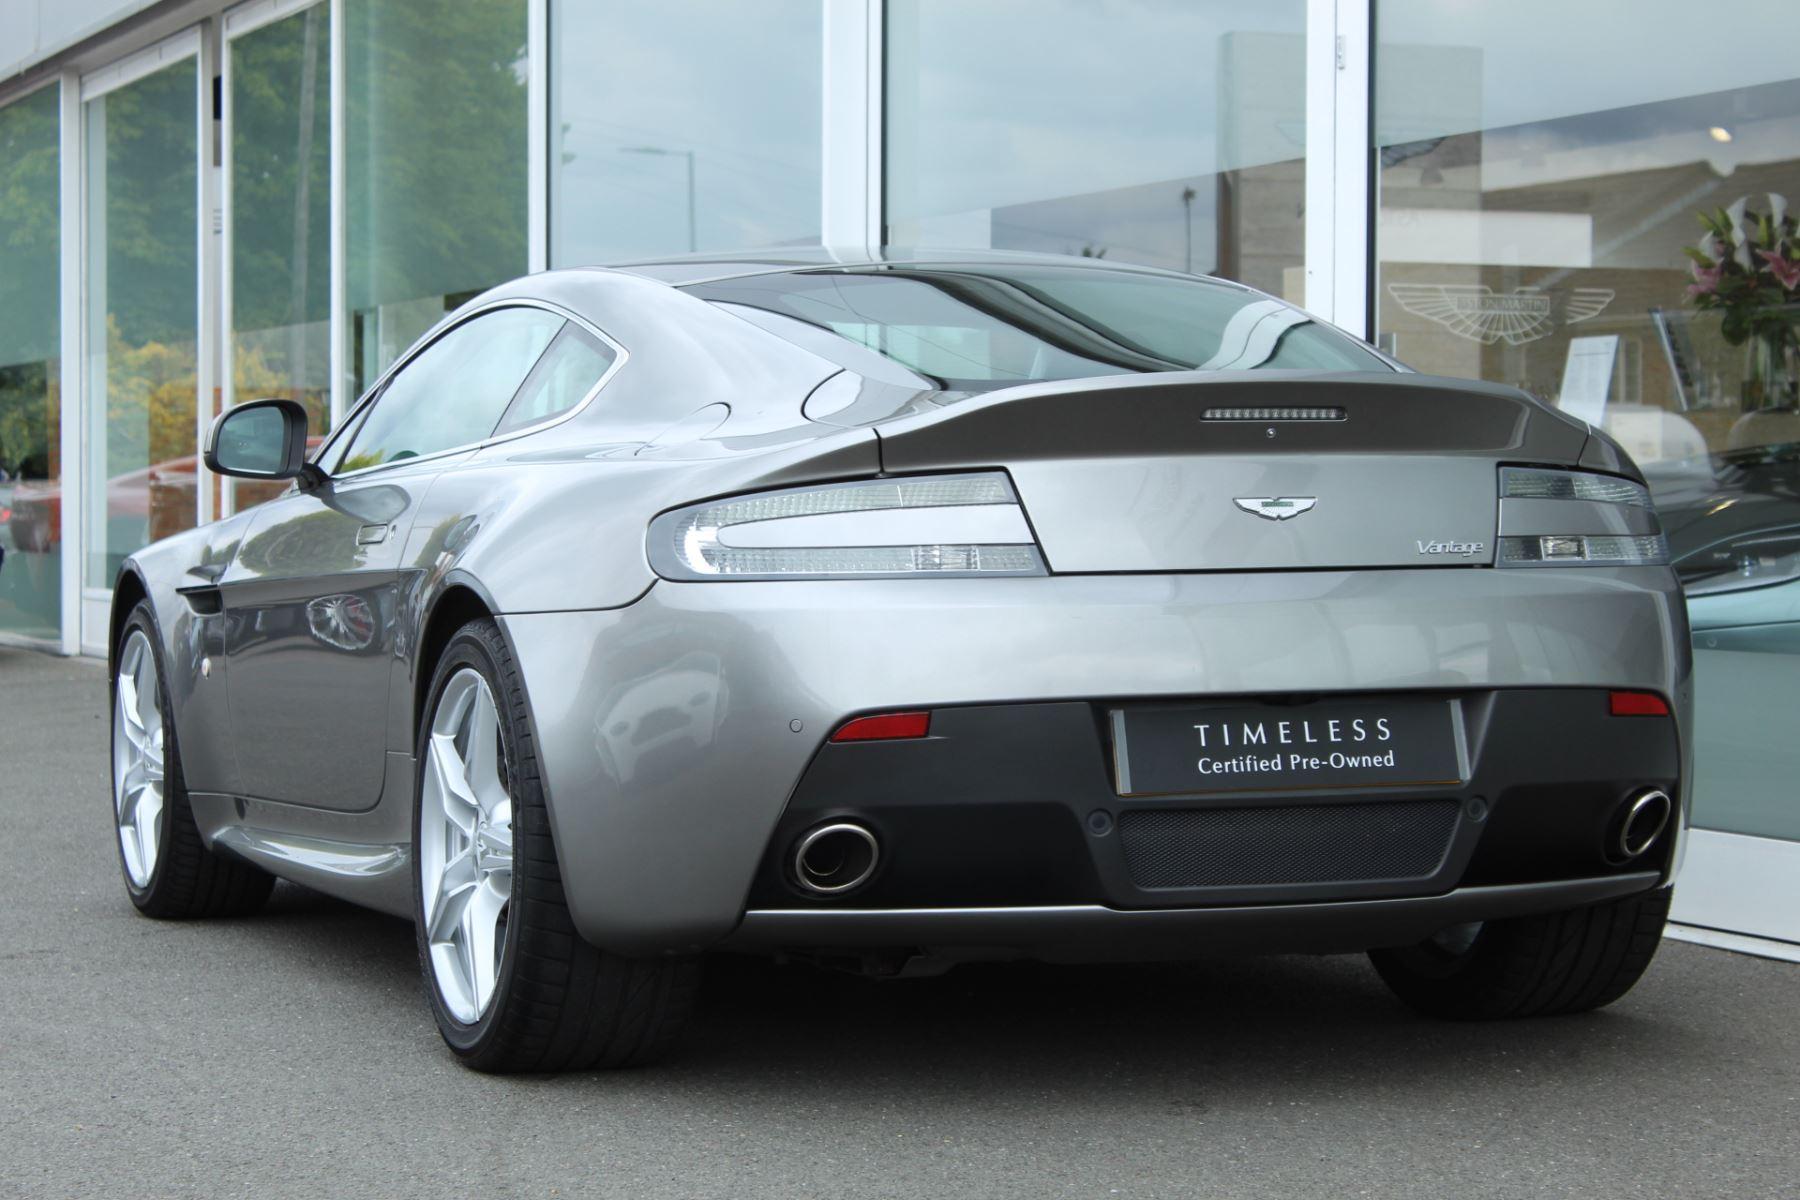 Aston Martin V8 Vantage Coupe 2dr Sportshift [420] image 15